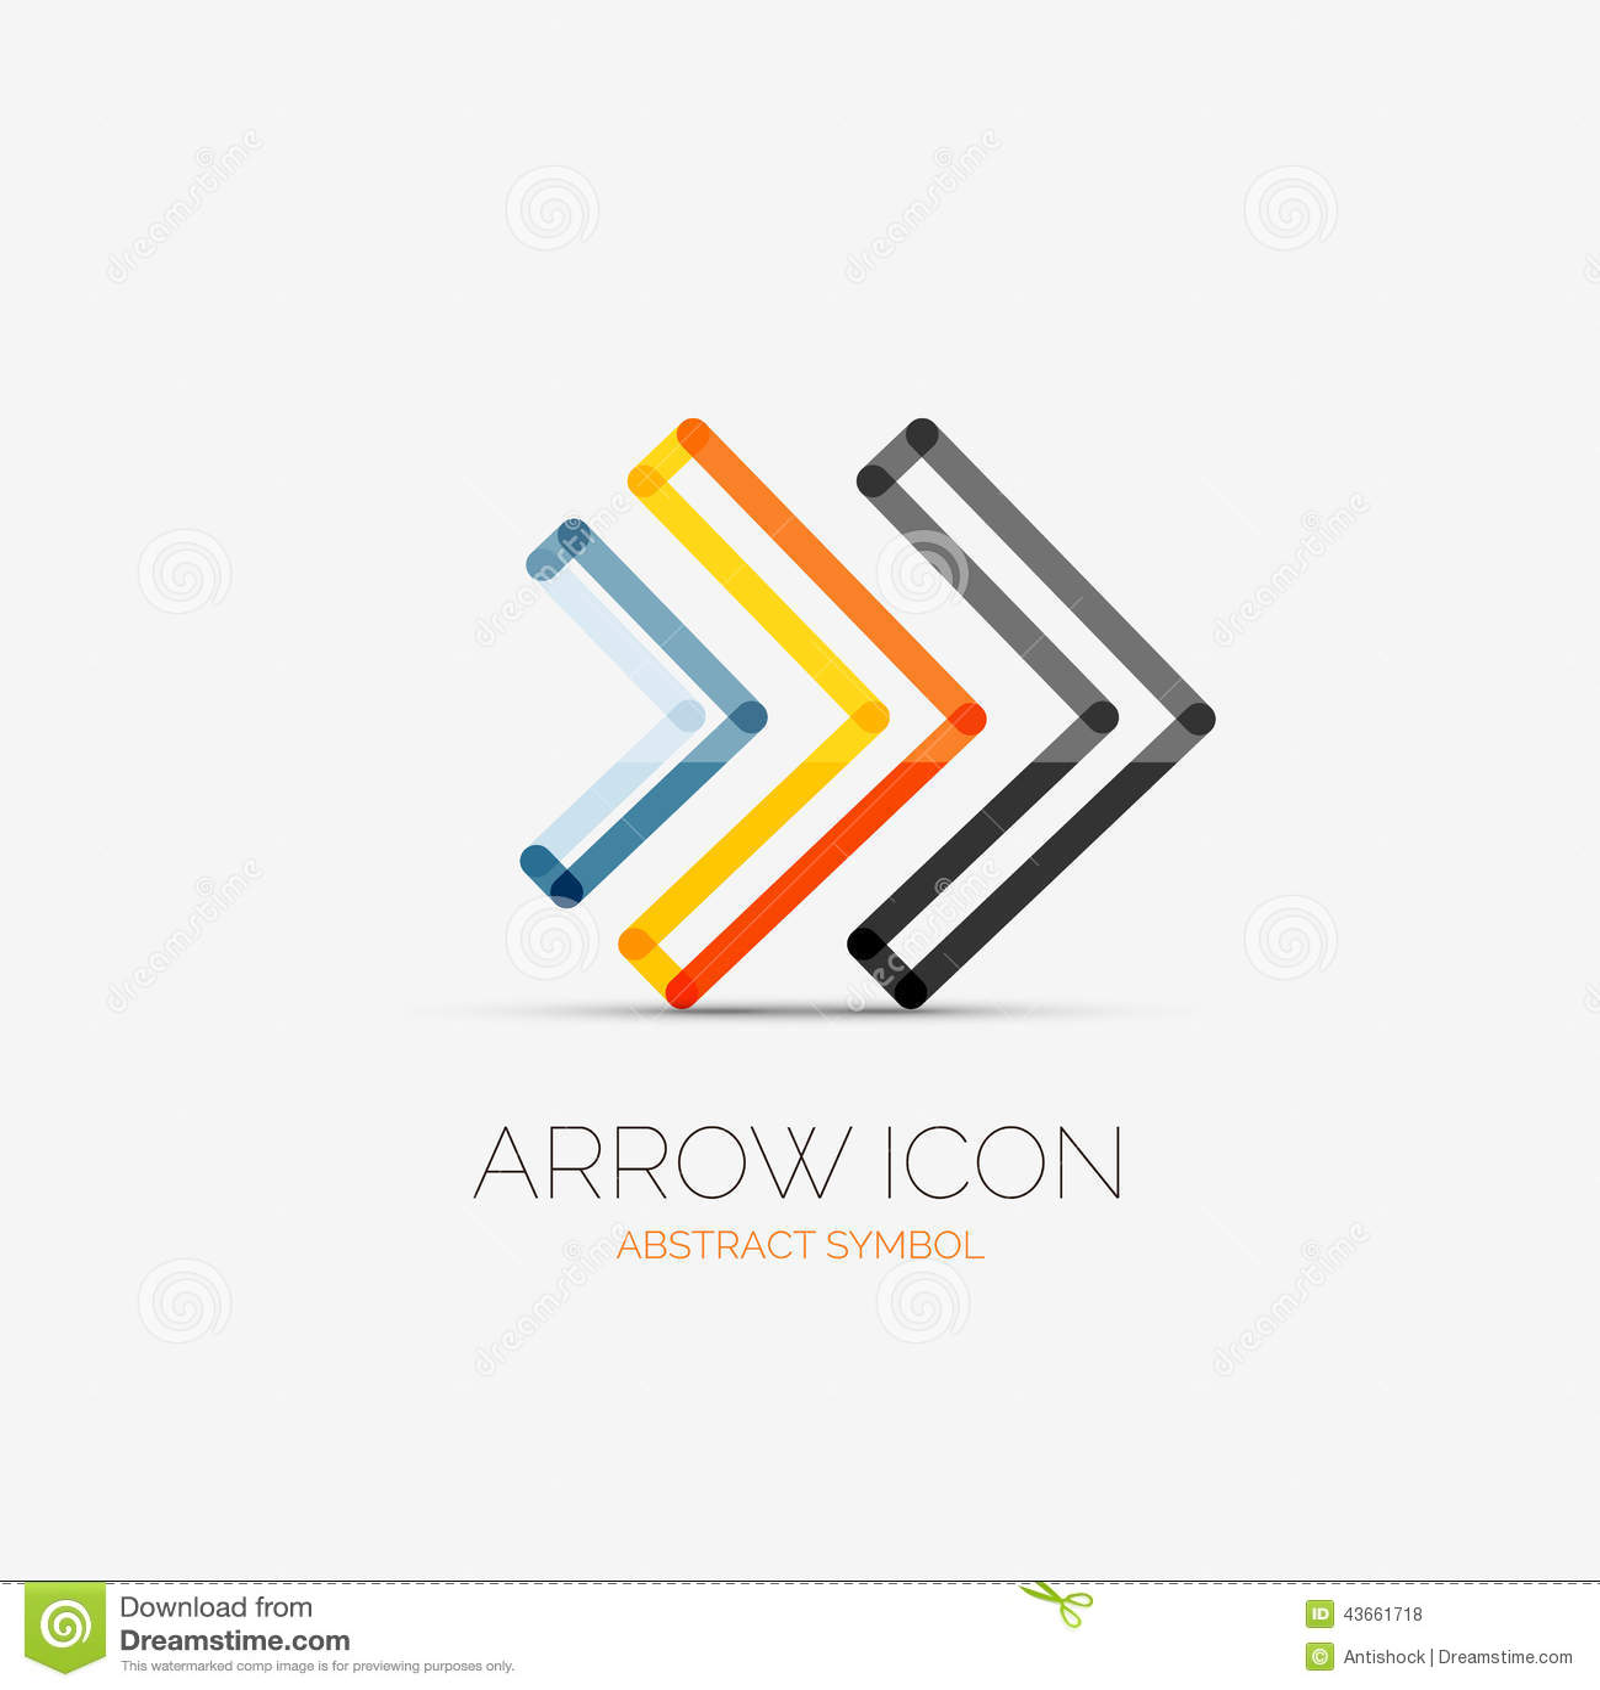 Right arrows company logo, business concept